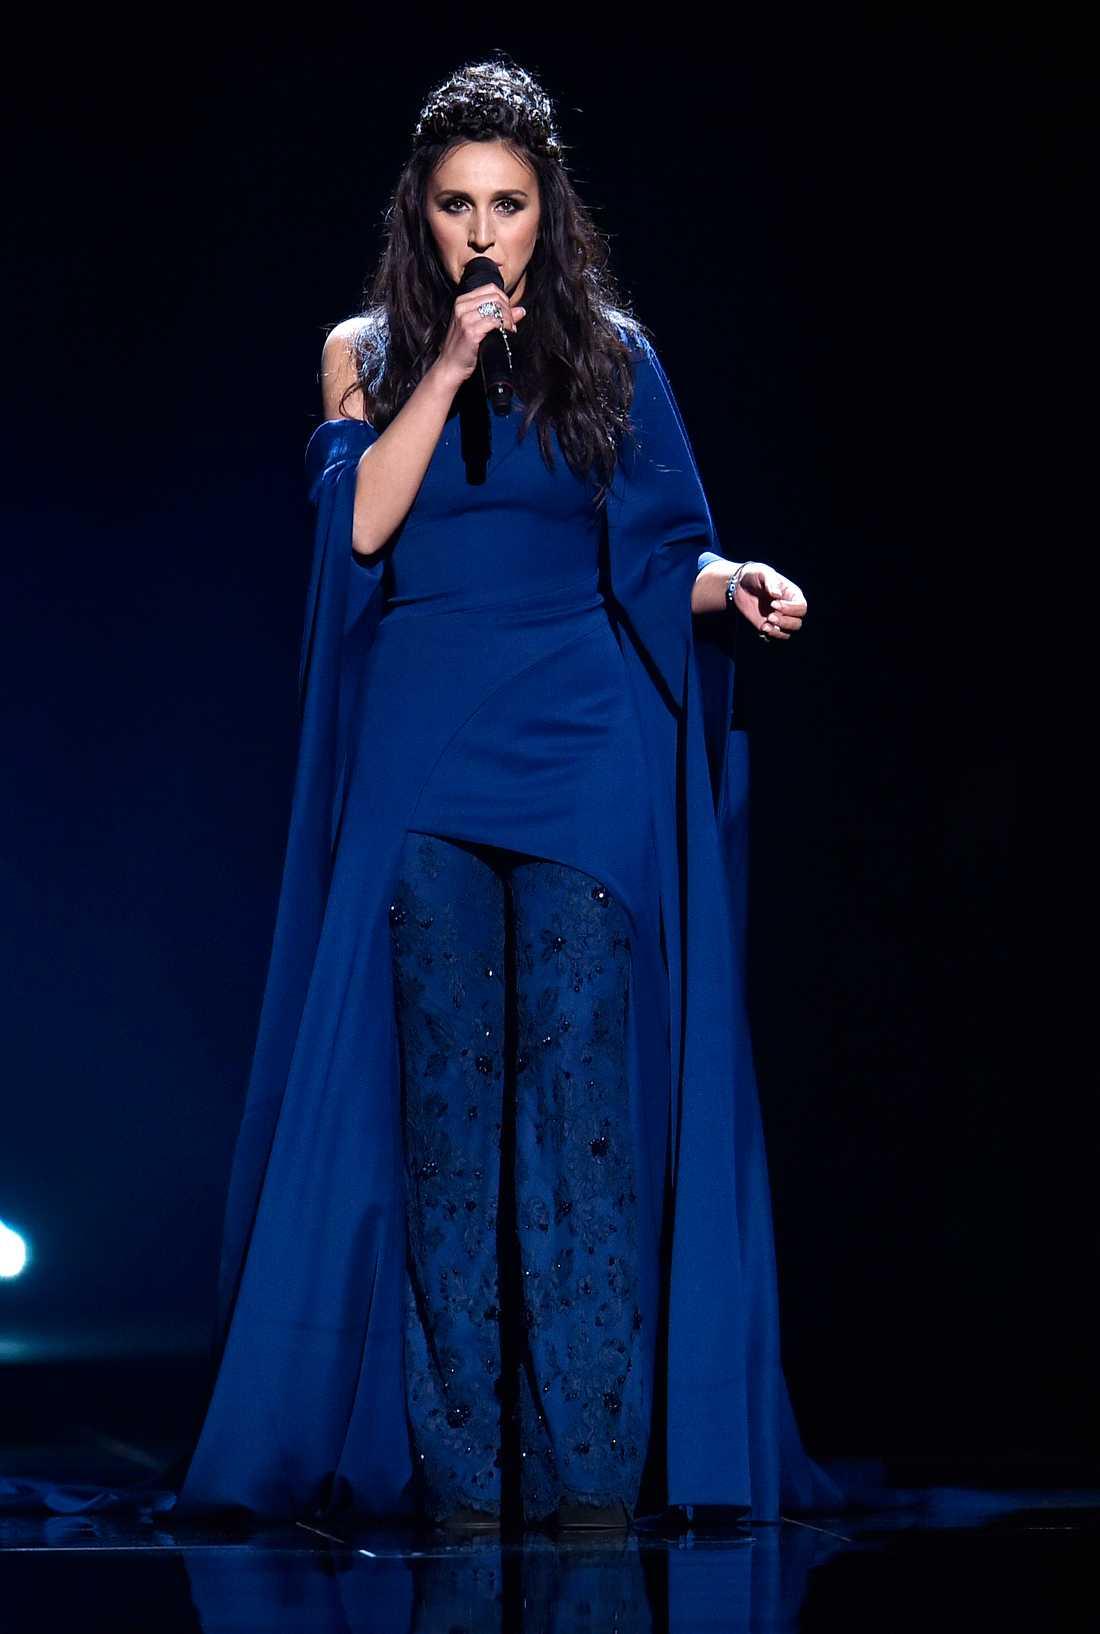 Jamala uppträder Eurovision song contest i Stockholm 2016